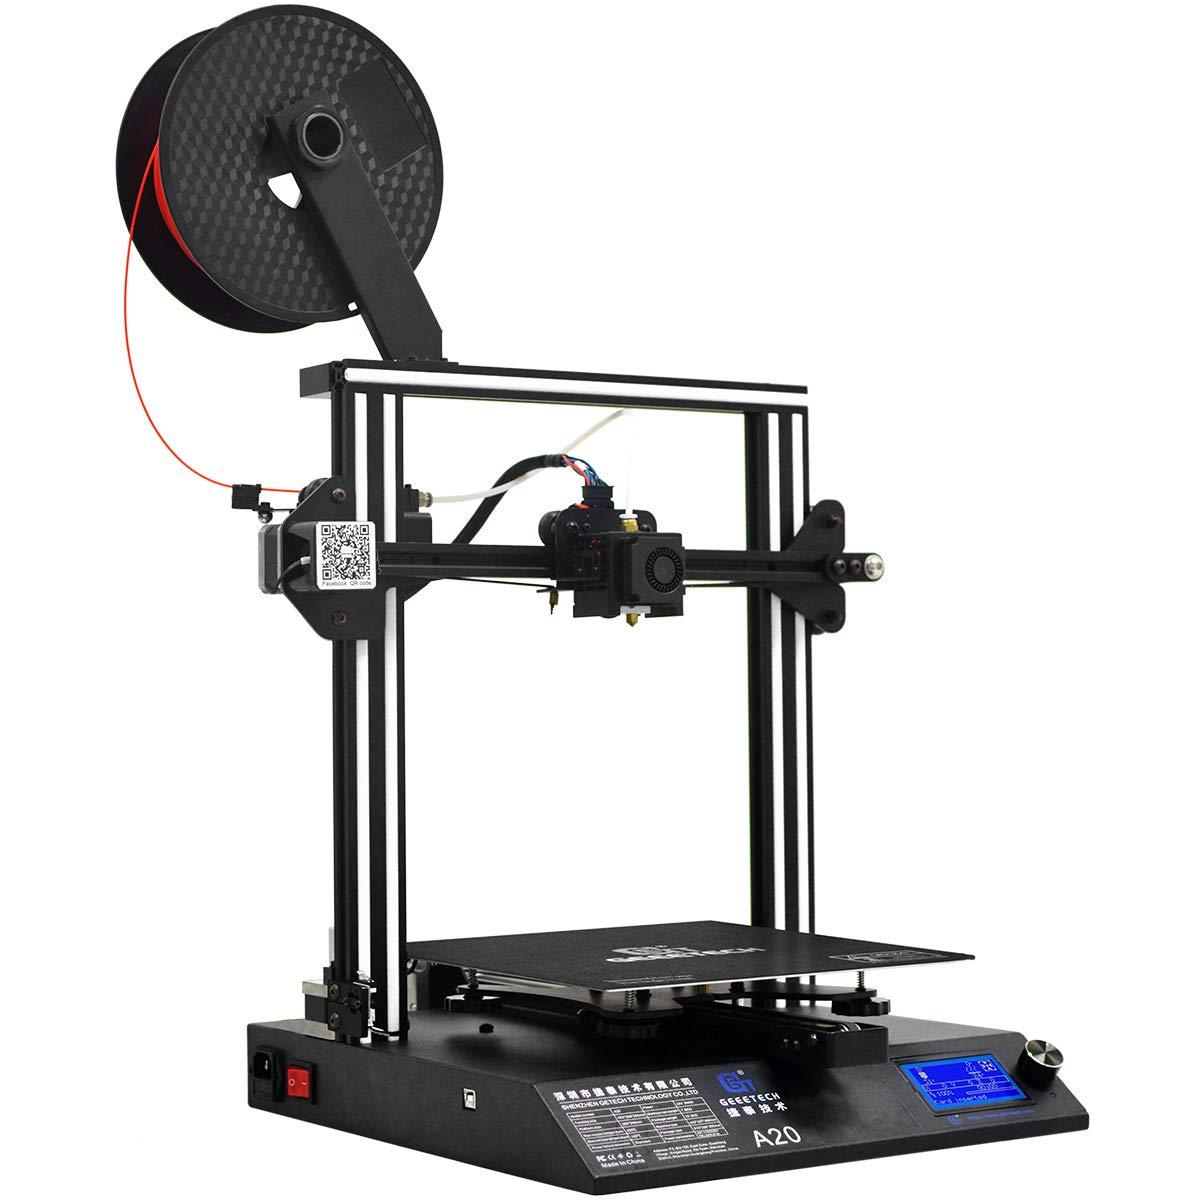 giantarm Geeetech A20 Impresora 3d con amplio campo de diseño años ...